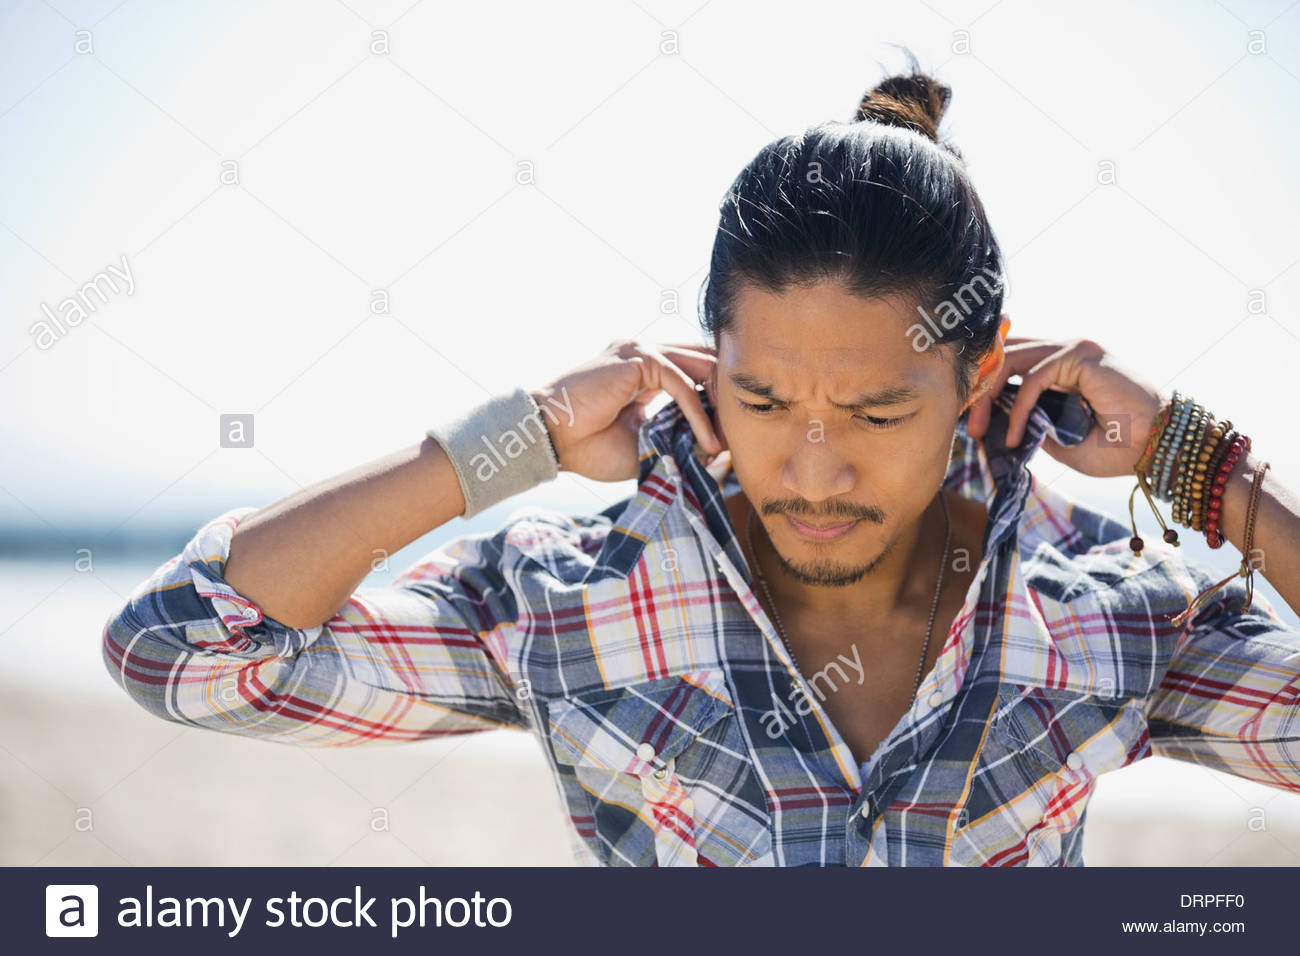 Man adjusting shirt collar - Stock Image